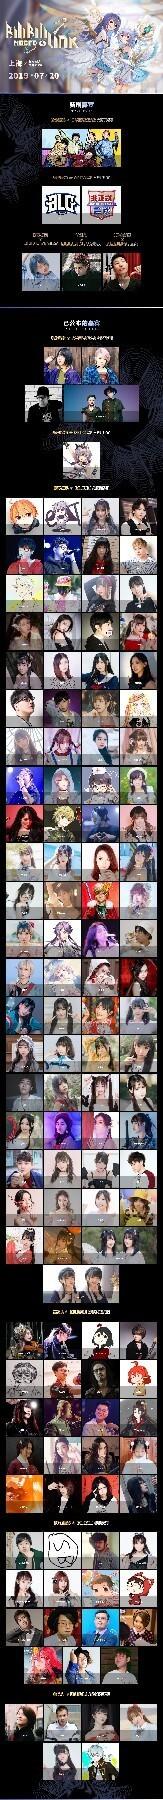 BML2019梦幻嘉宾阵容 引爆燃情夏日-C3动漫网